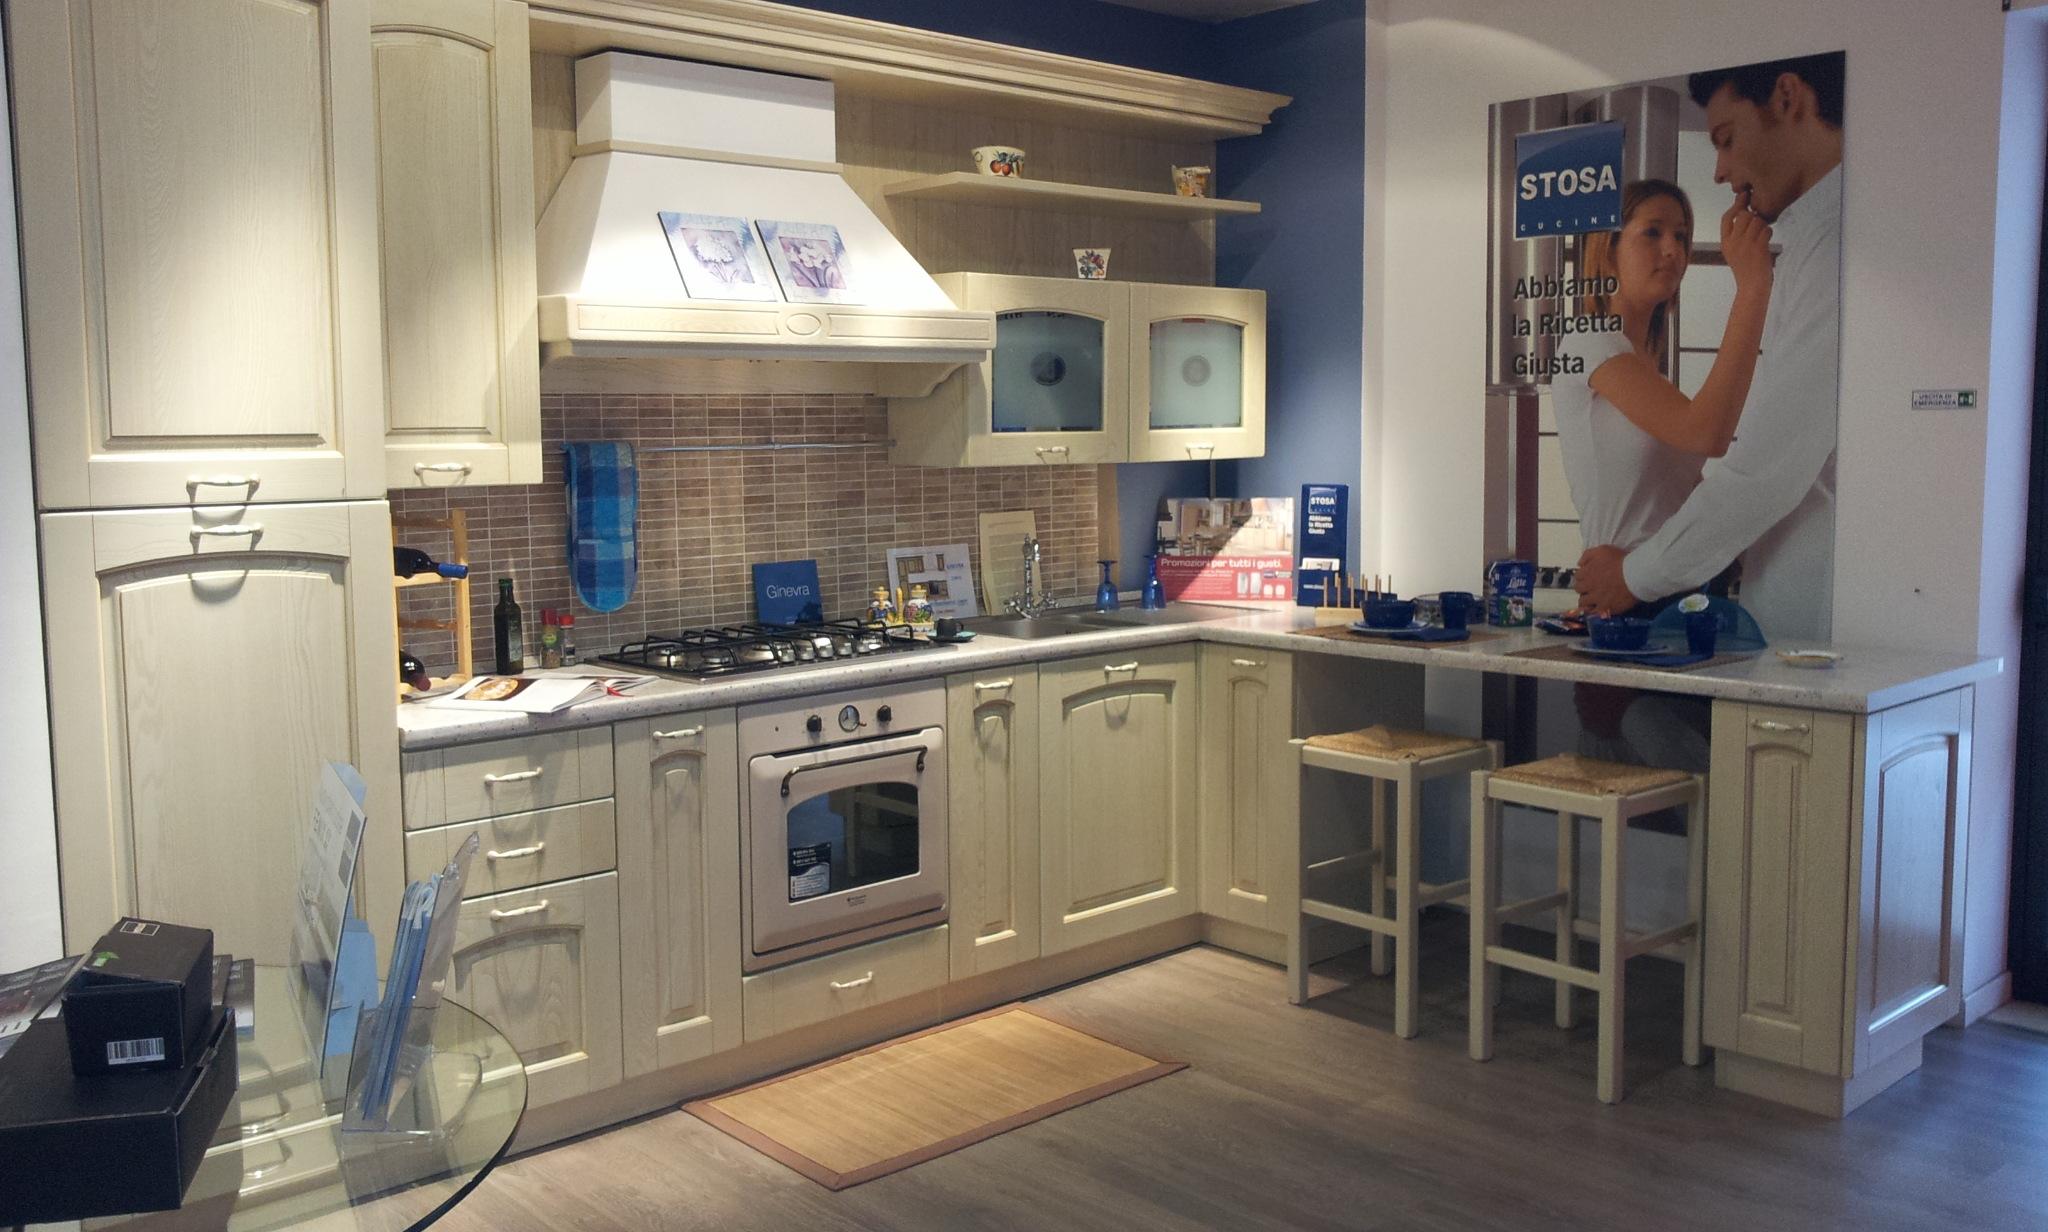 Cucina con penisola stosa cucine ginevra cucine a prezzi - Cucina color panna ...